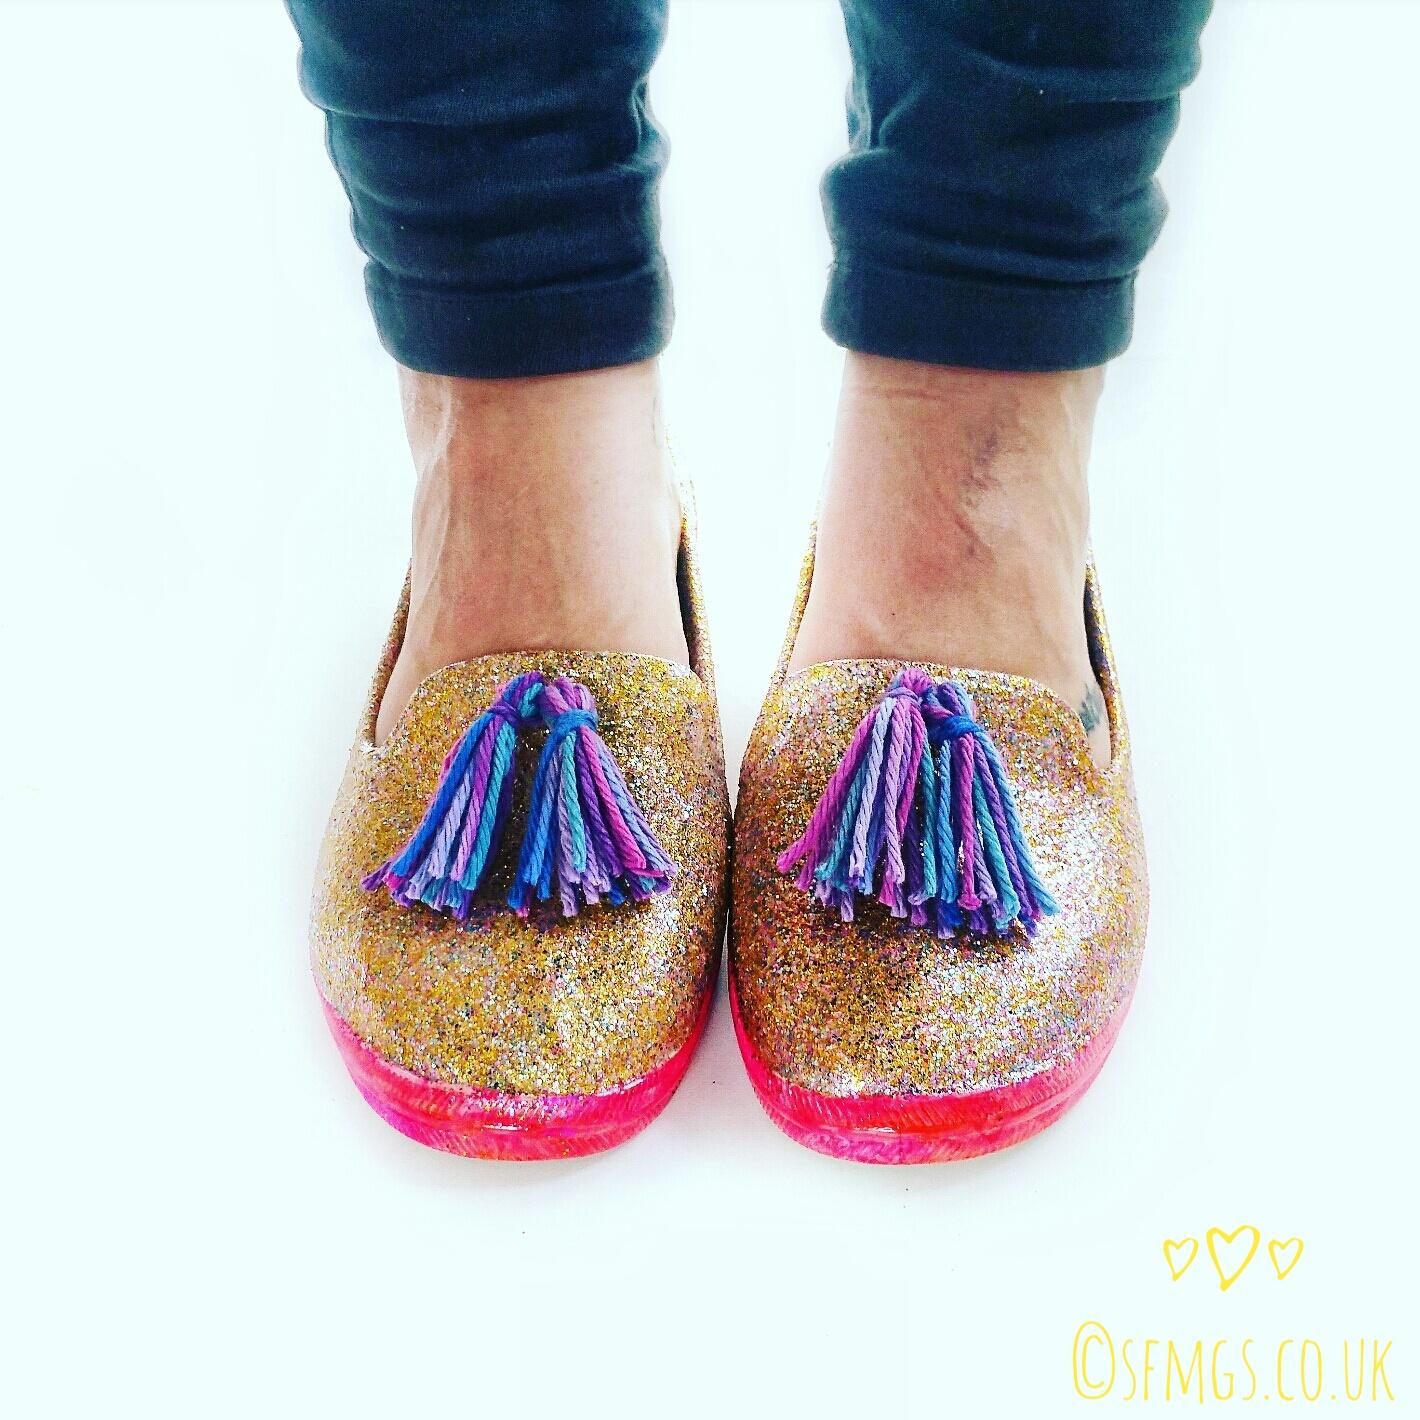 diy-glitter-shoe-pump-trainer-refashion-upcycle-tutorial-lily-sugar-n-cream-modge-podge-4